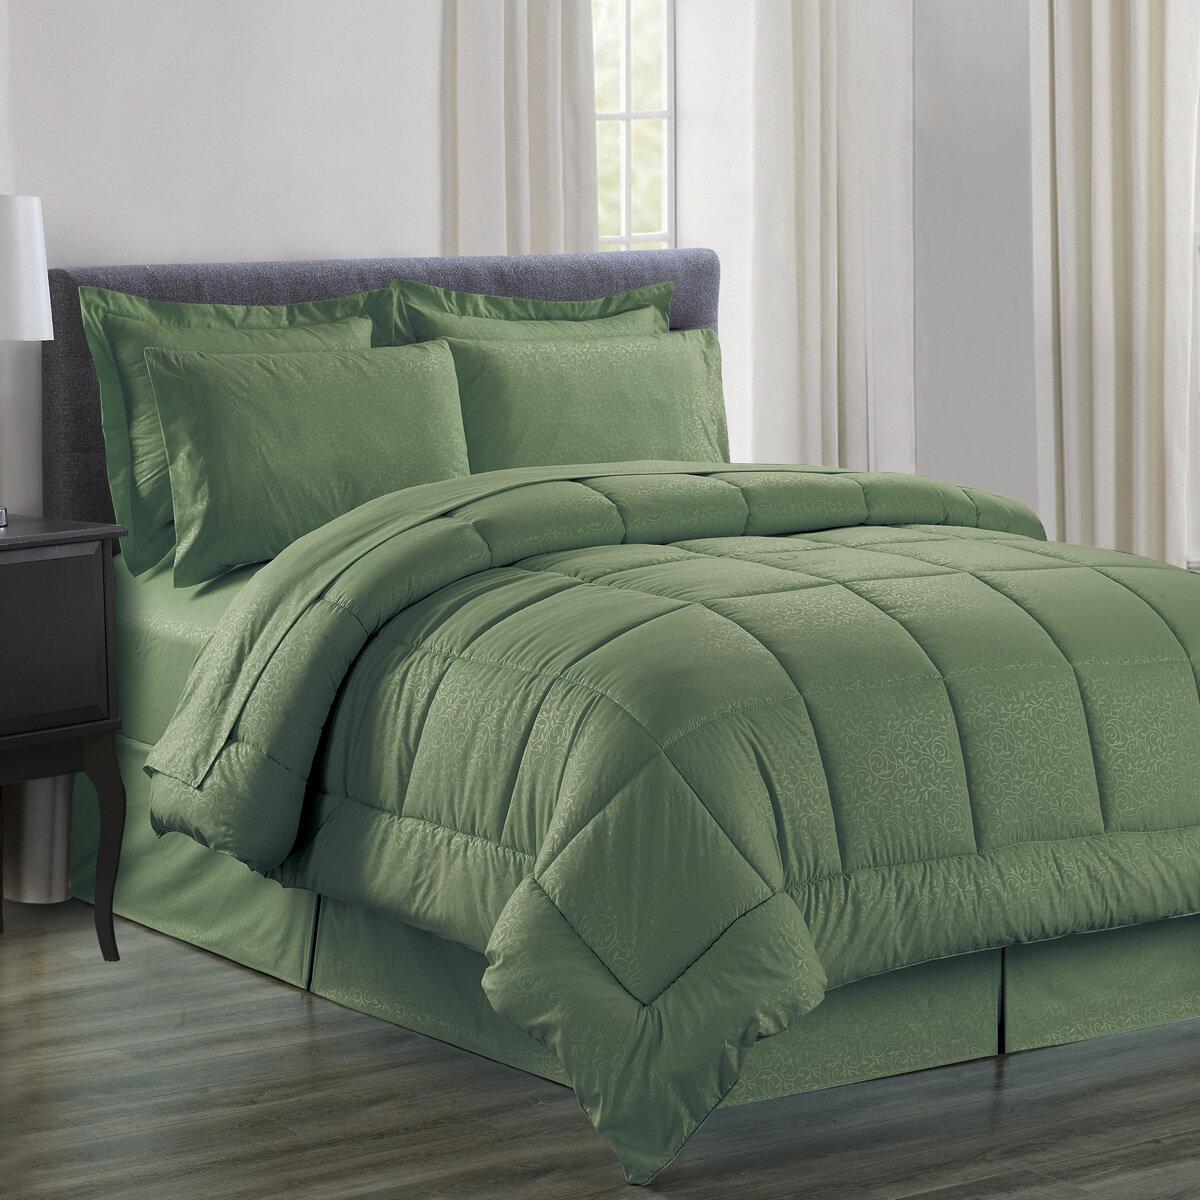 Red Barrel Studio Chad Embossed Vine Down Comforter Set Reviews Wayfair